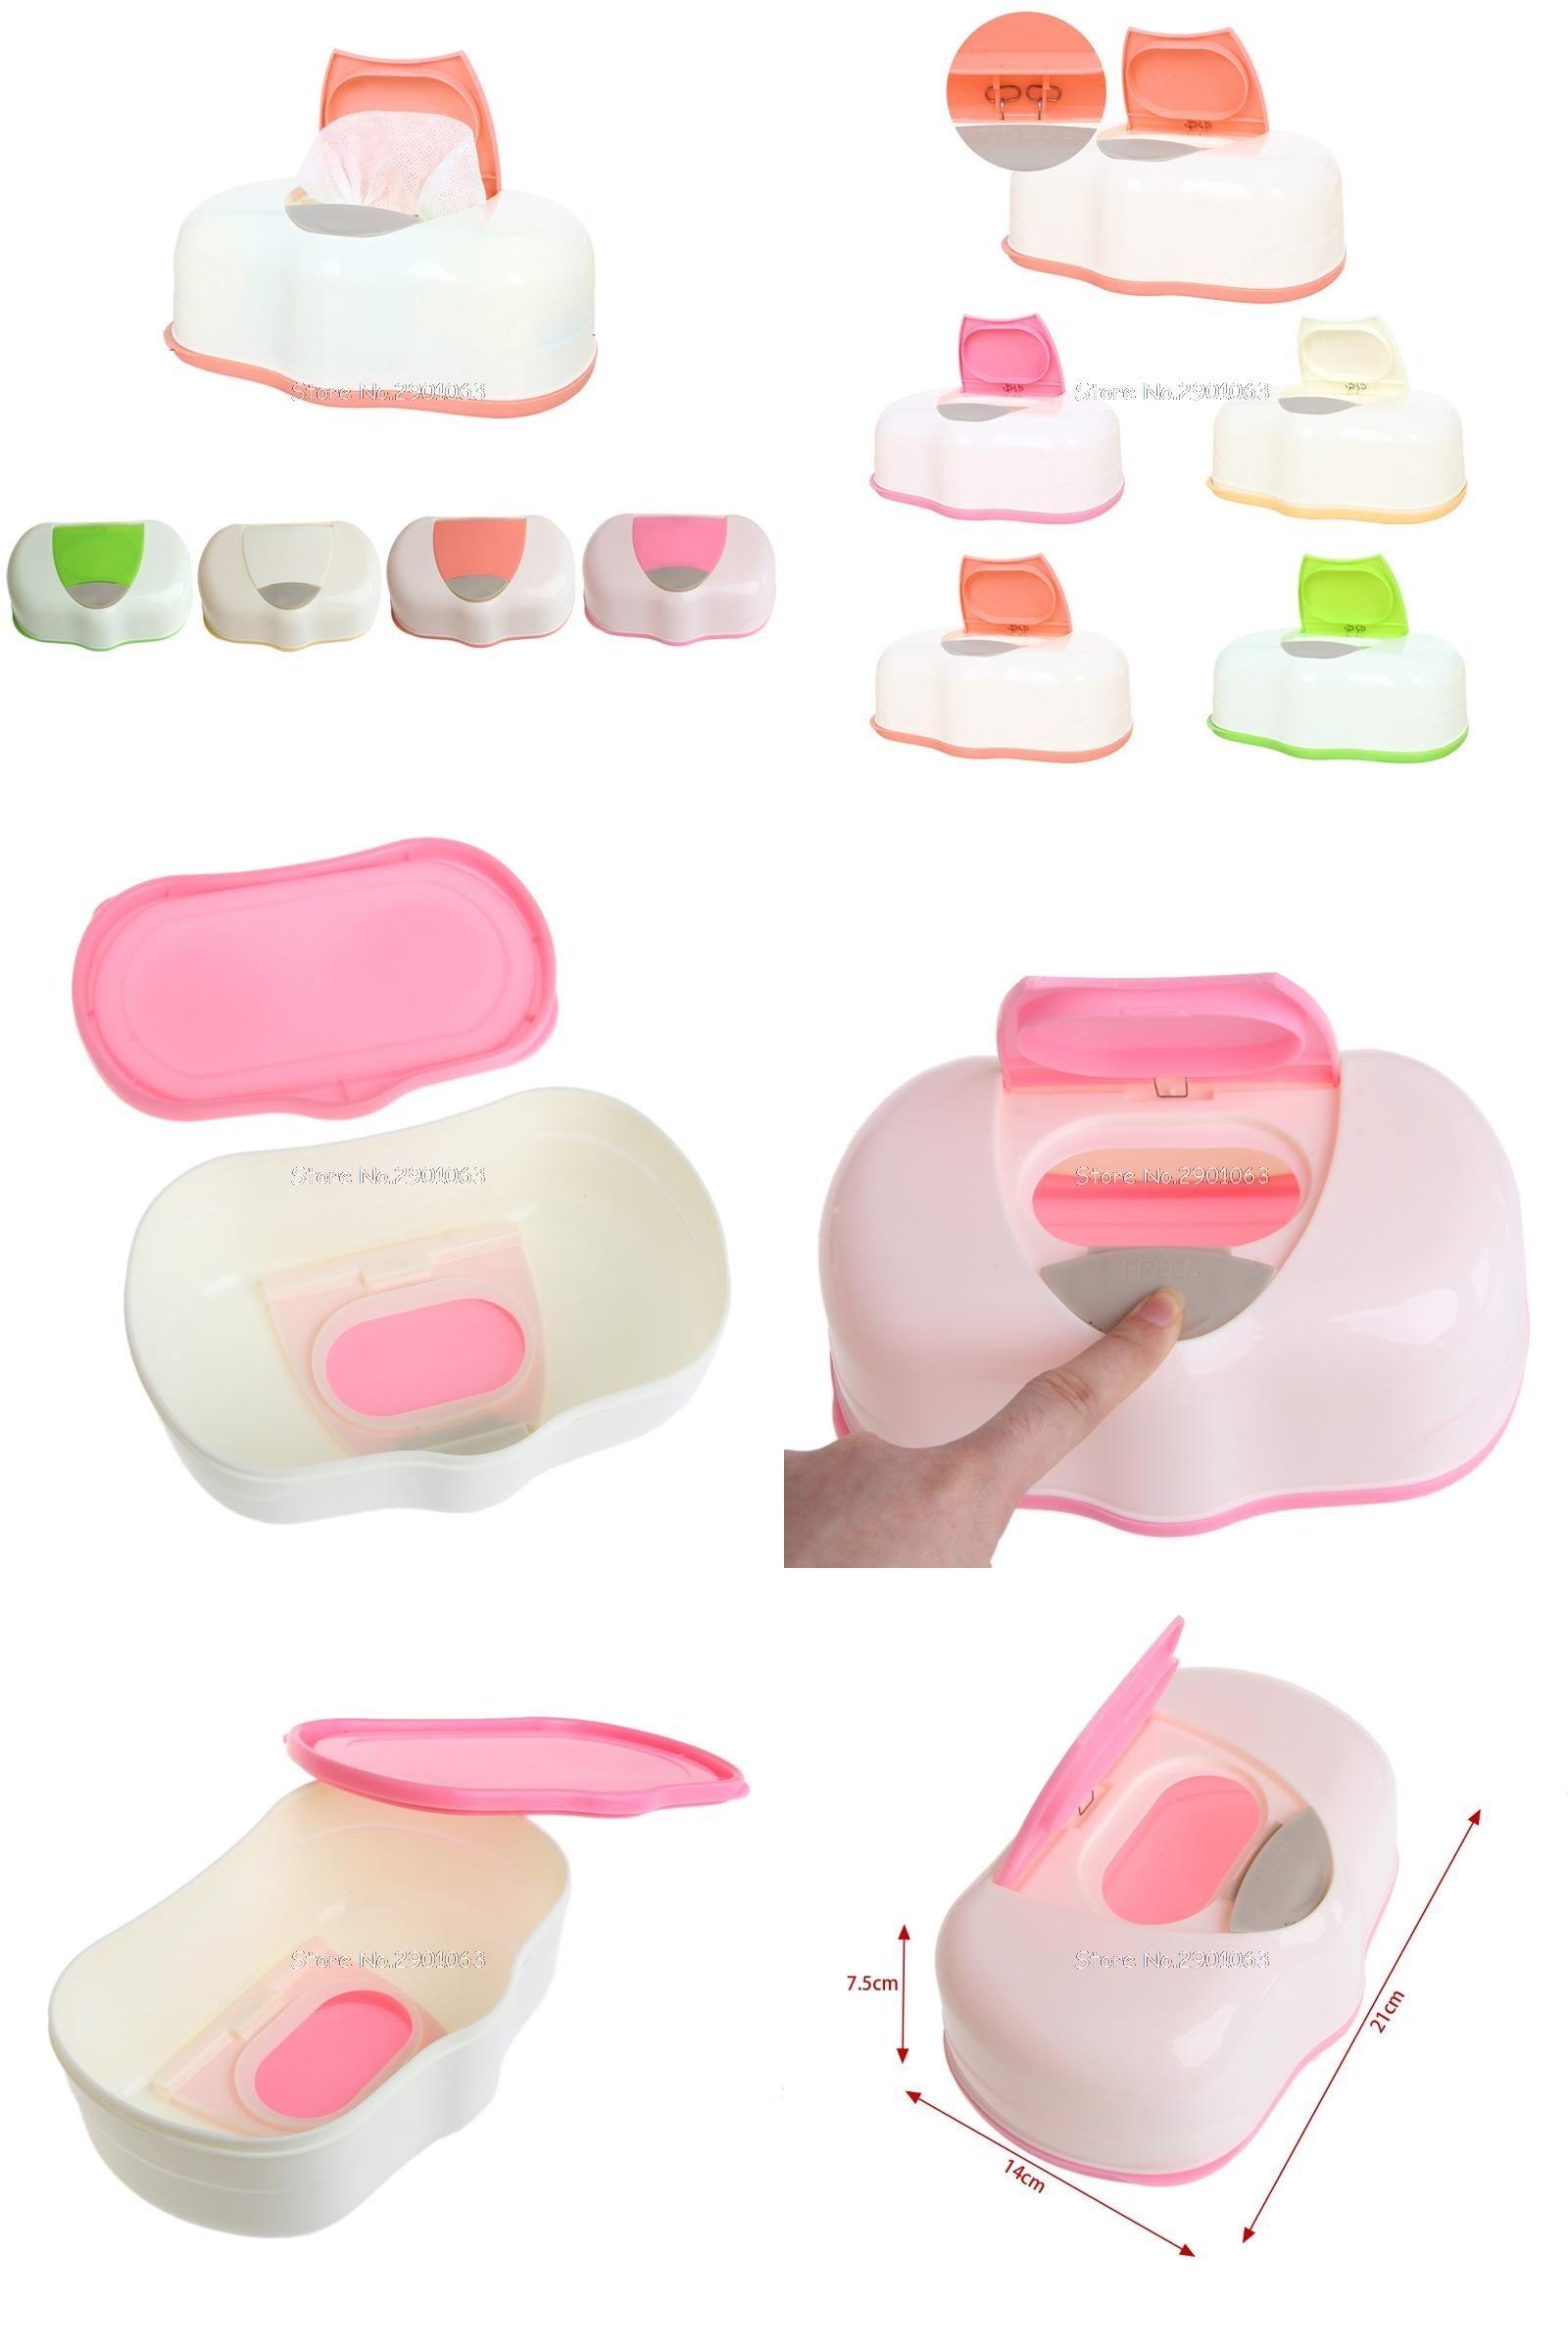 Visit to Buy] Tissue Box Plastic Wet Wipes Storage Case Box ...